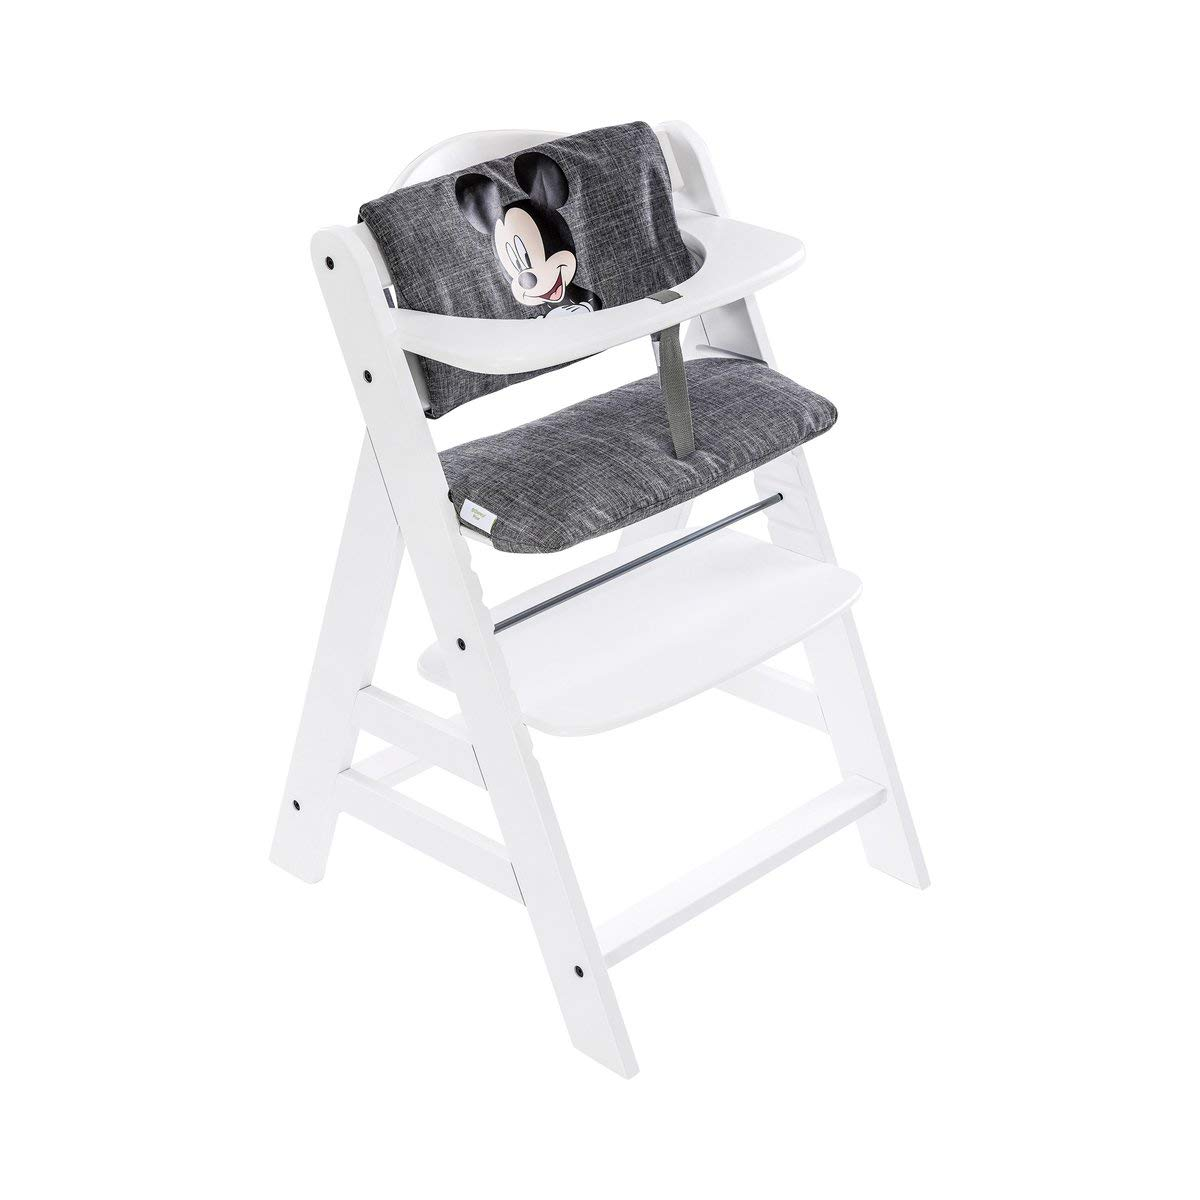 Hauck Hochstuhlauflage Deluxe Sitzpolster Minnie grey TOP